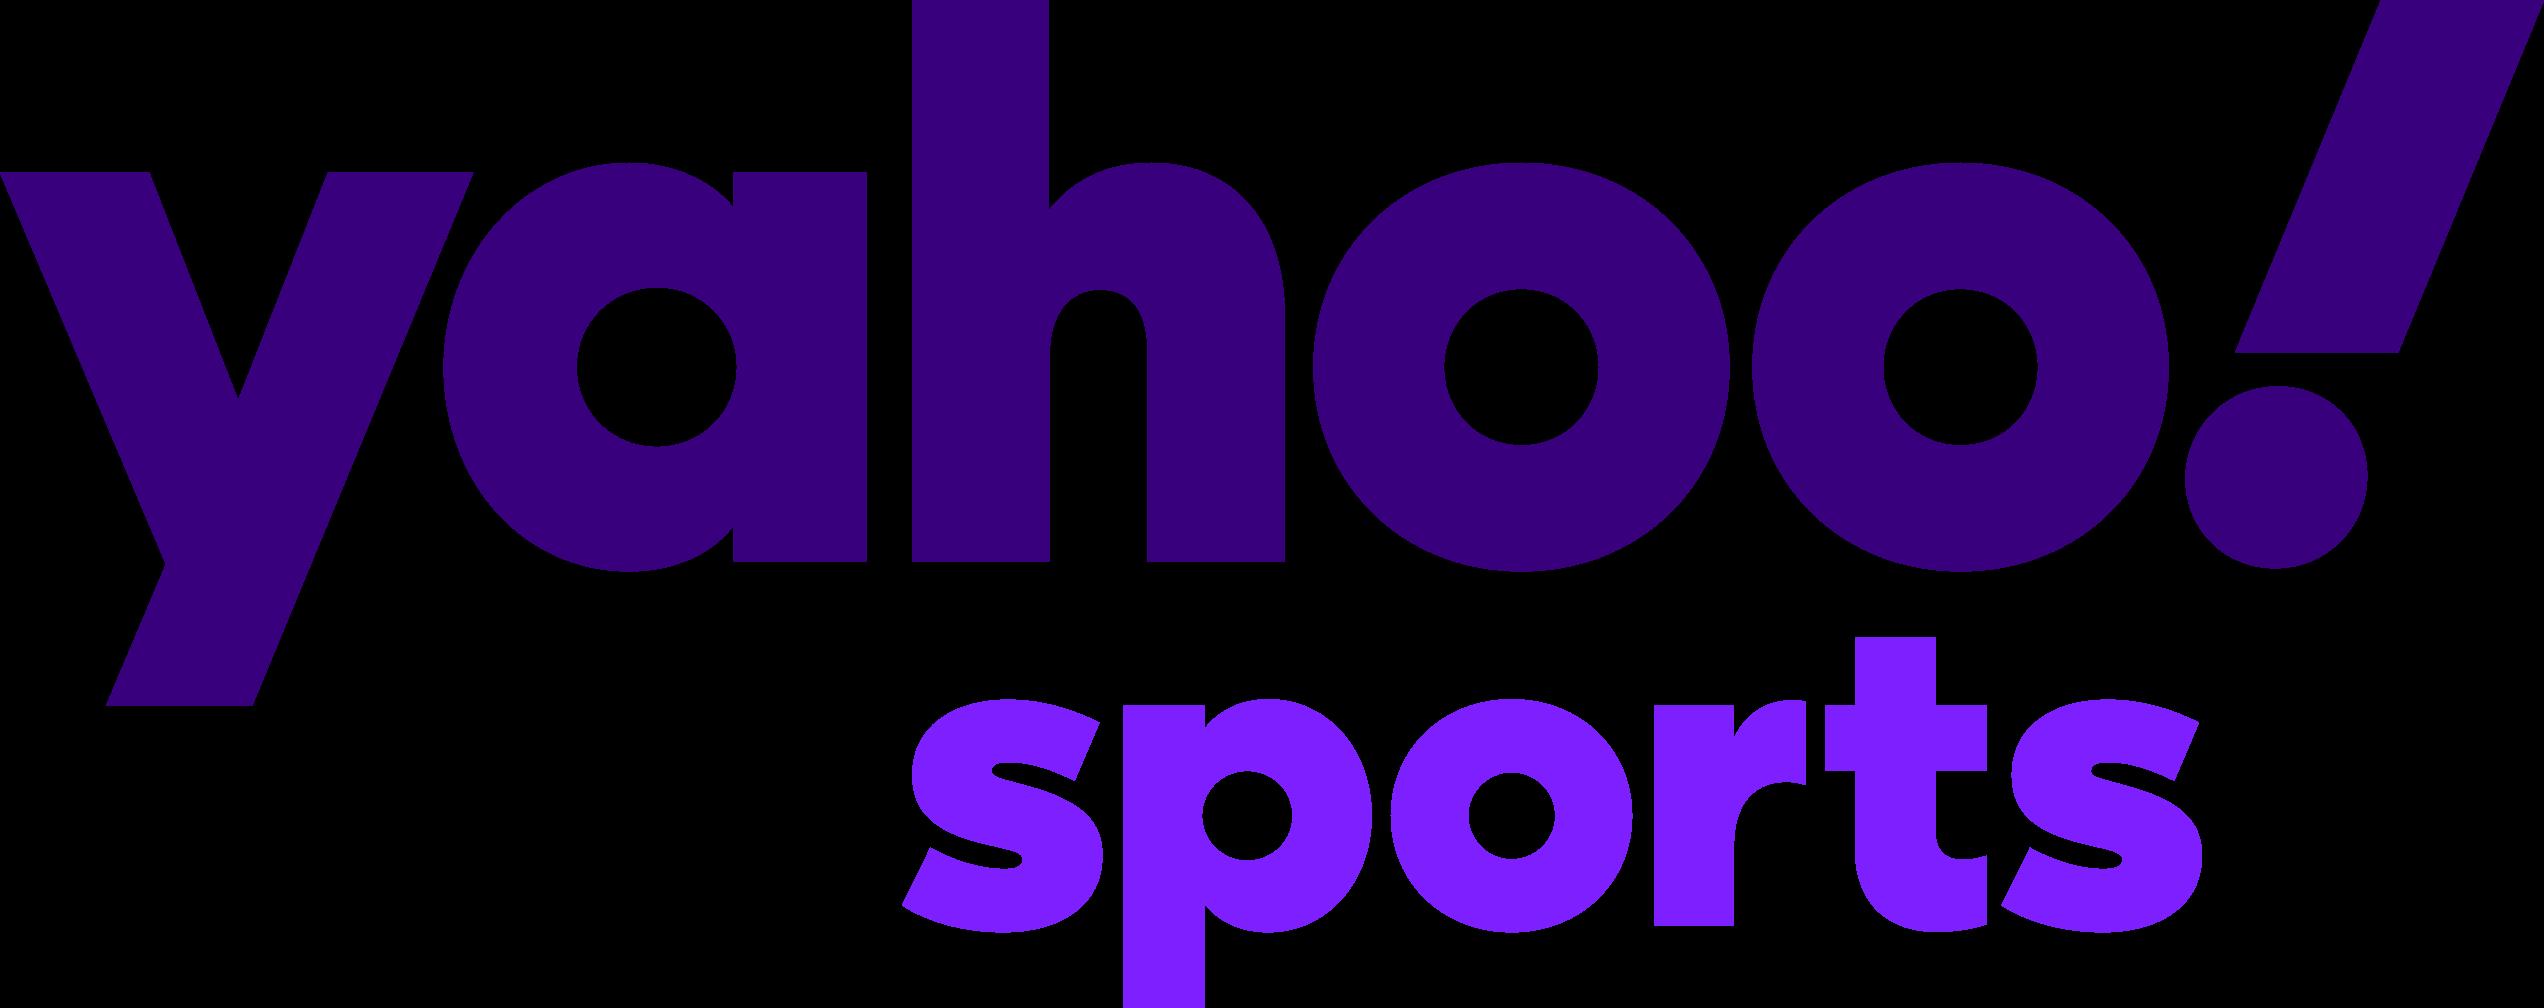 by Yahoo Sports logo